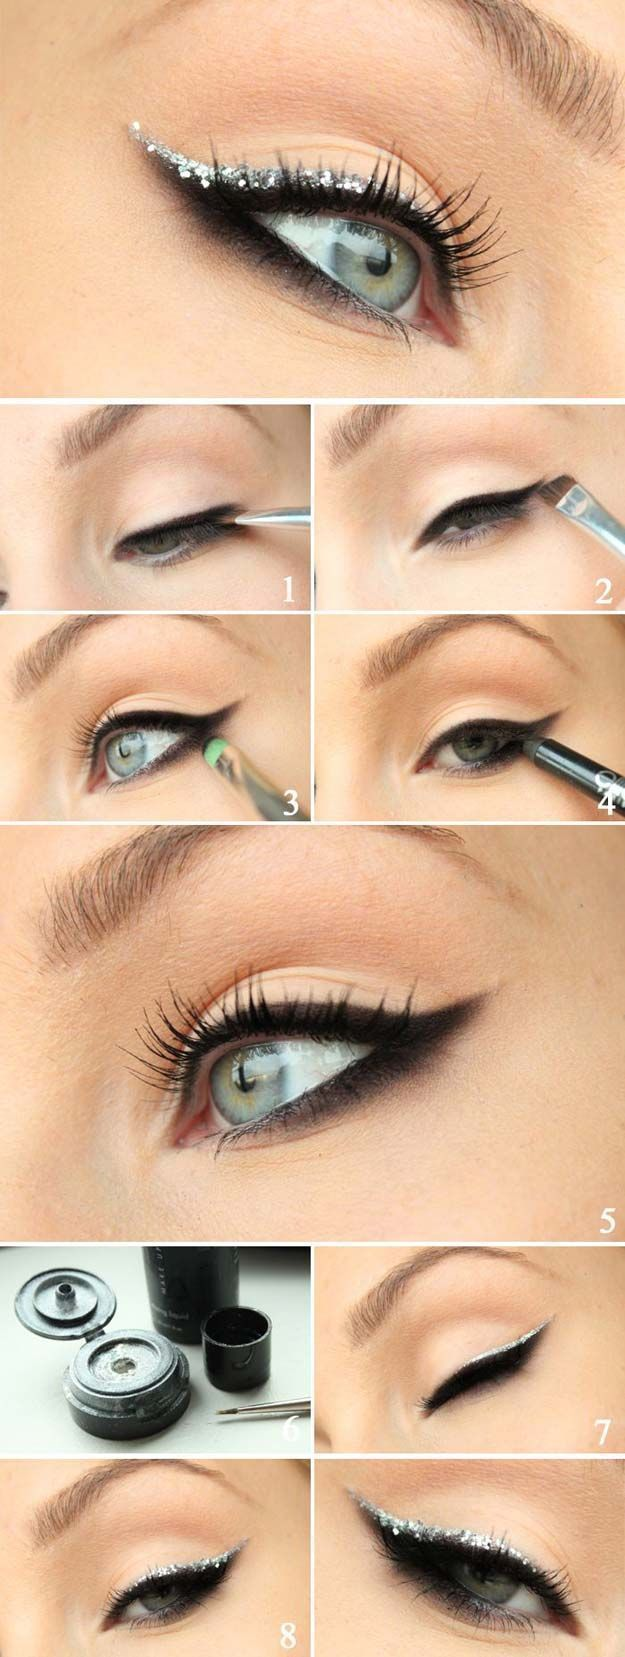 best ideas for makeup tutorials : best makeup tutorials for teens